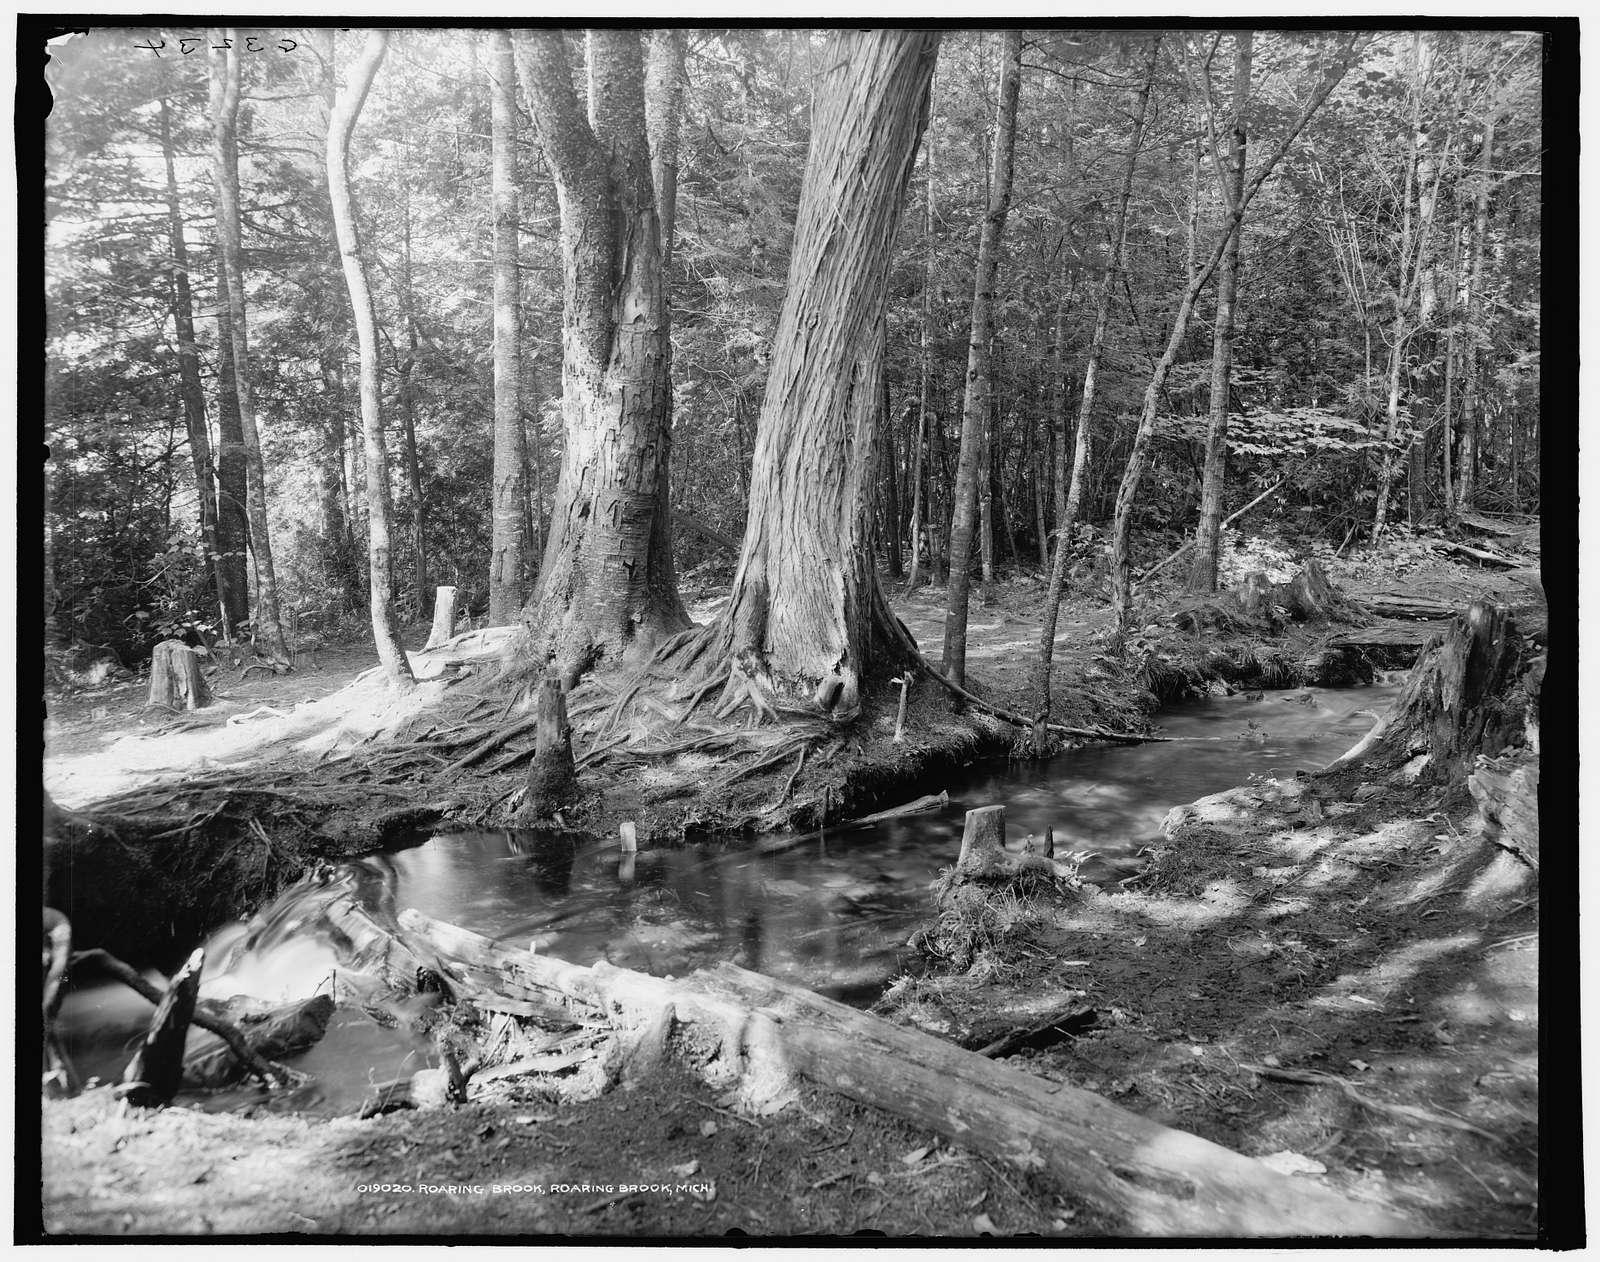 Roaring Brook, Roaring Brook, Mich